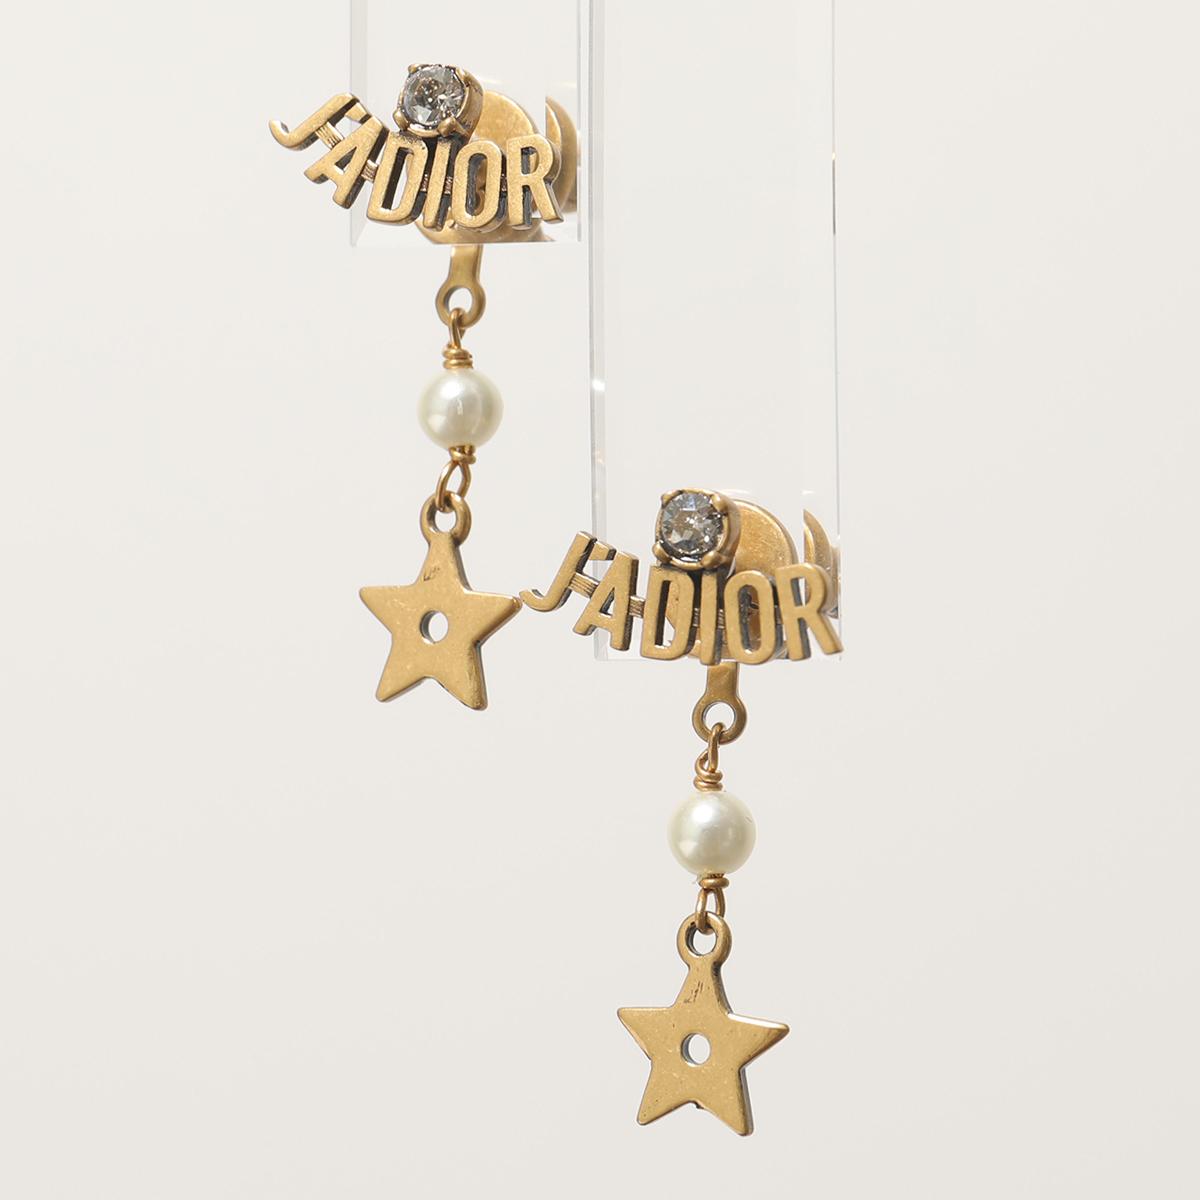 Dior ディオール E1209 ADRCY J'Adior & star クリスタル装飾 ロゴ 星 スター パール スタッドピアス 908/AntGold-Wh レディース